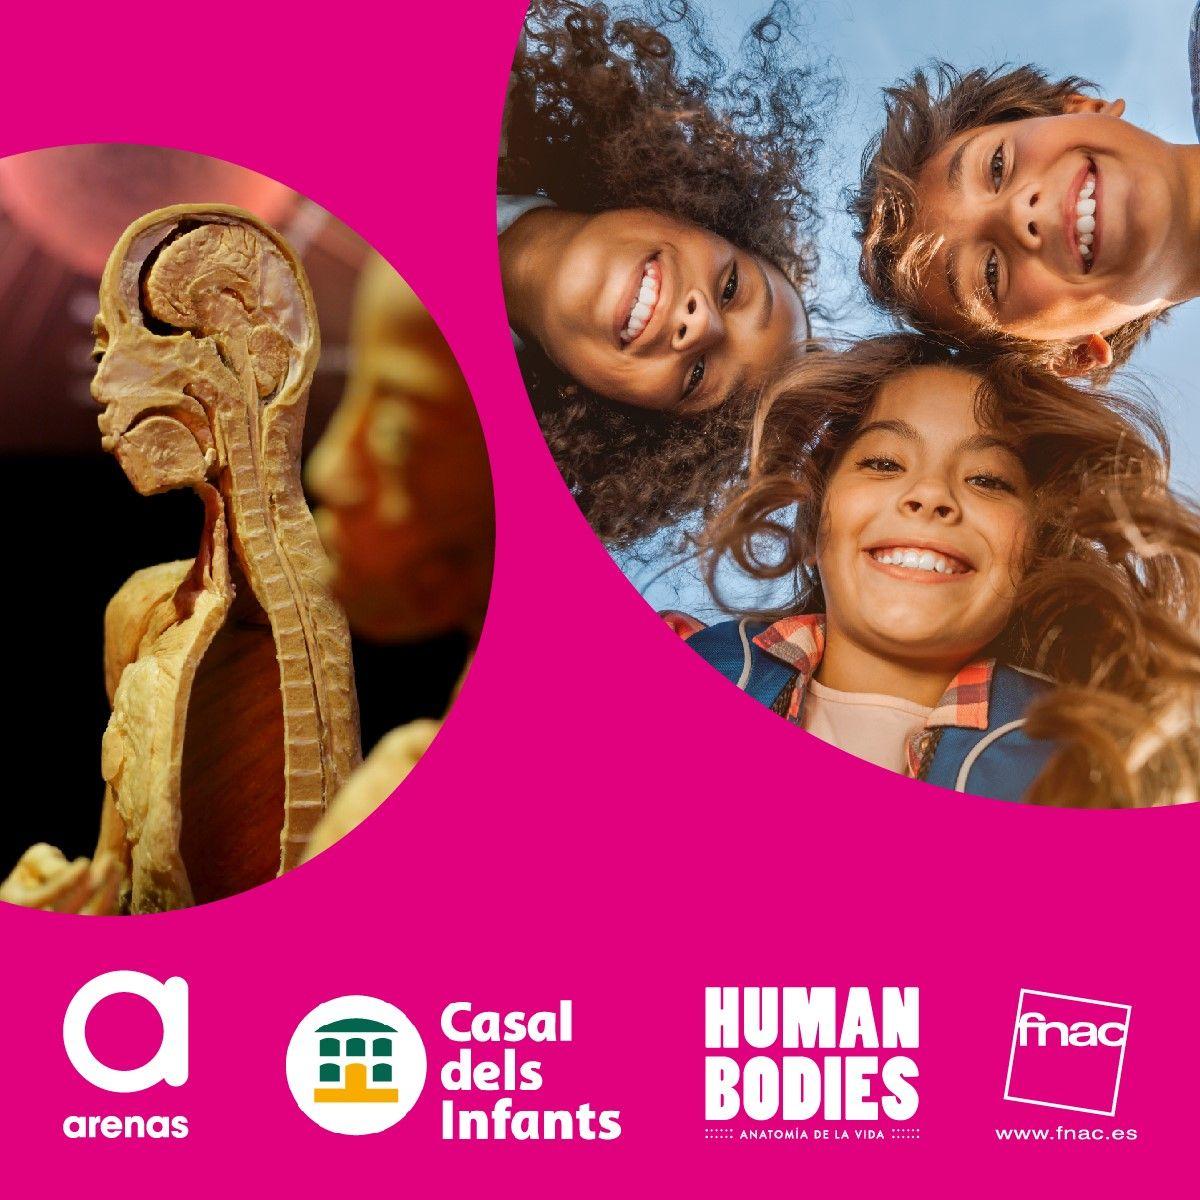 Arenas donó al Casal dels Infants de Barcelona dispositivos móviles